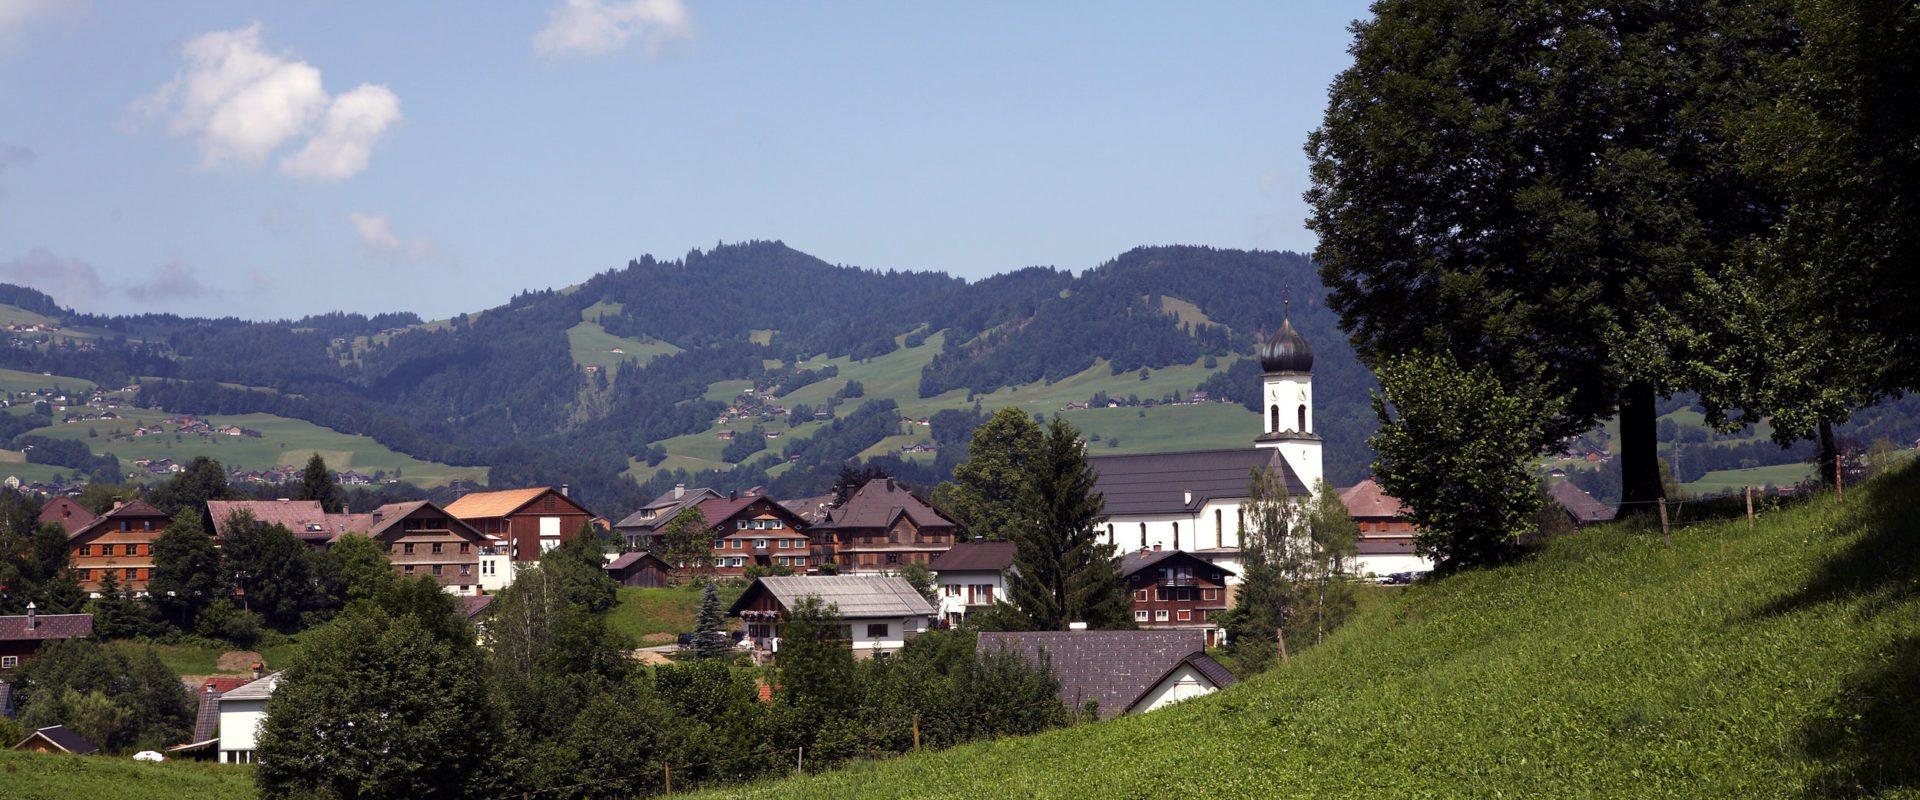 Schwarzenberg © Christoph Lingg / Bregenzerwald Tourismus